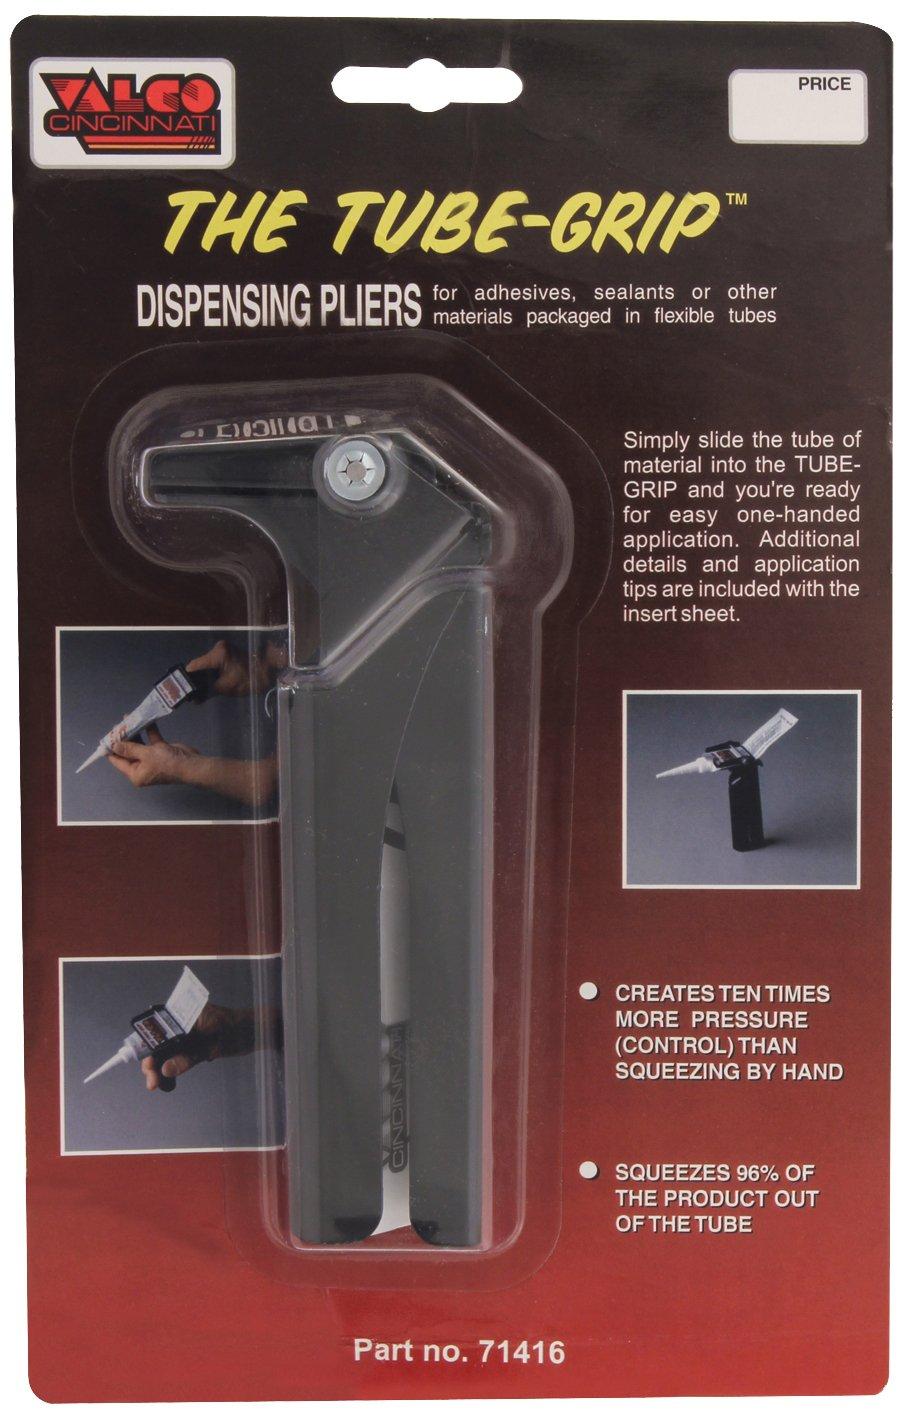 "Valco Cincinnati 71416 Tube-Grip 2"" Dispensing Plier with Sealant Dispensing Tool"